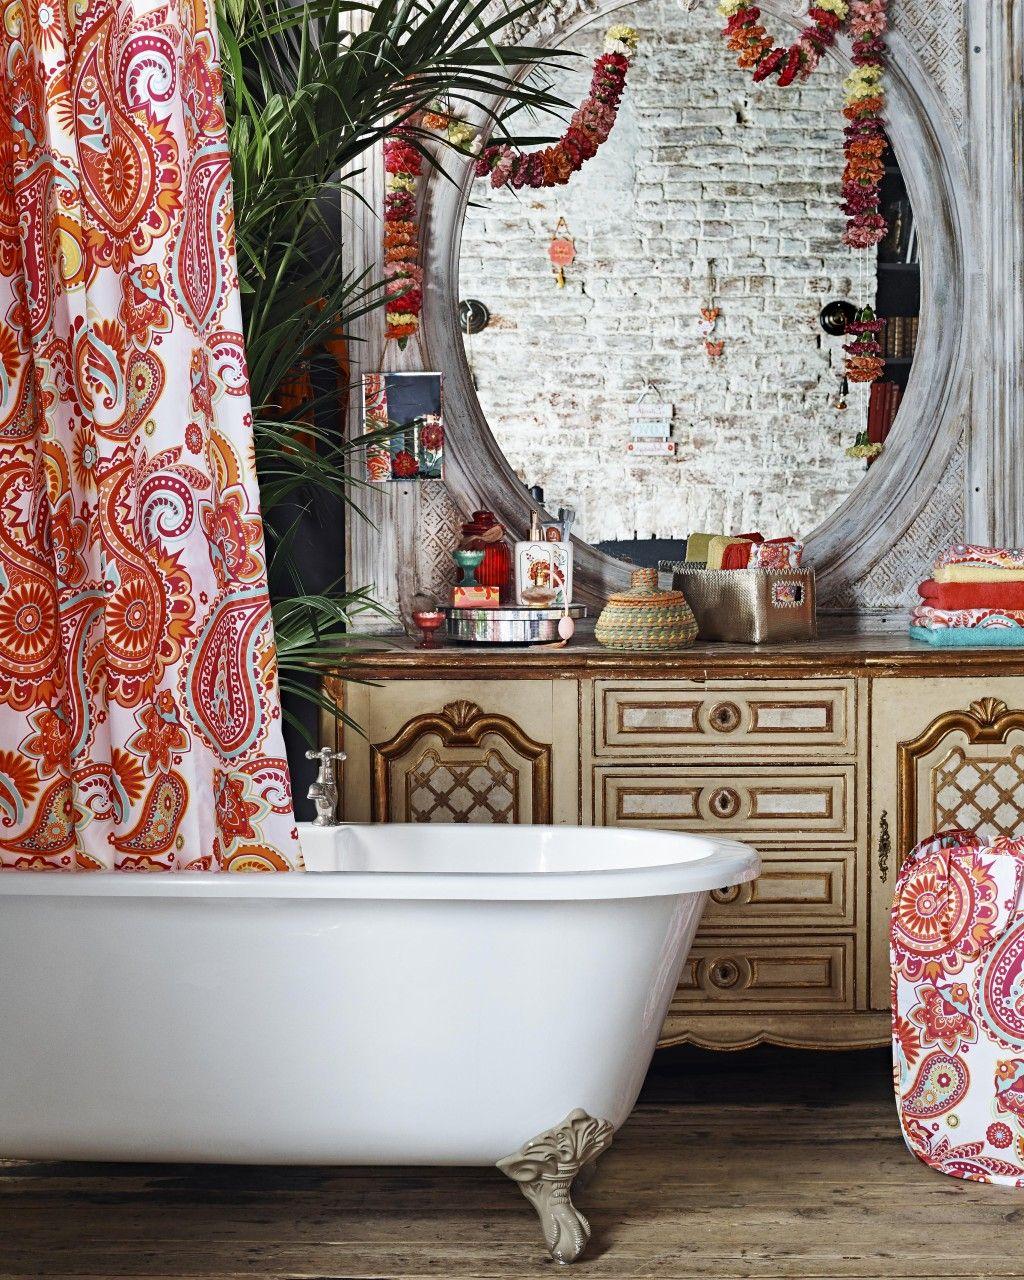 Primark Road to Morocco Bathroom